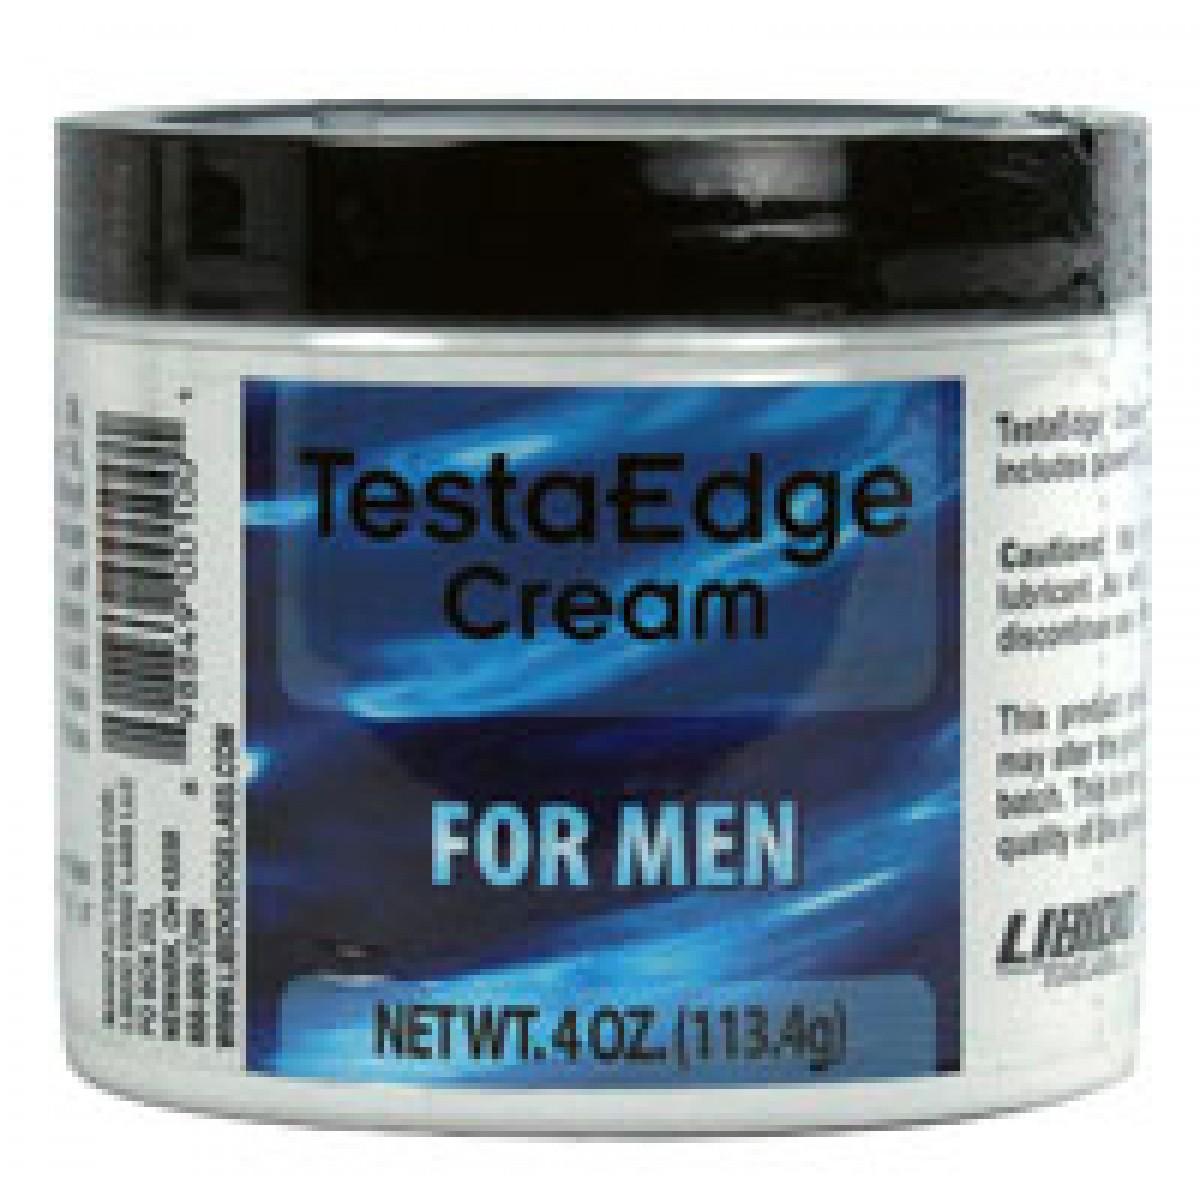 TESTOSTERONE CREAM FOR MEN 4 OZ - Natures Health Shoppe